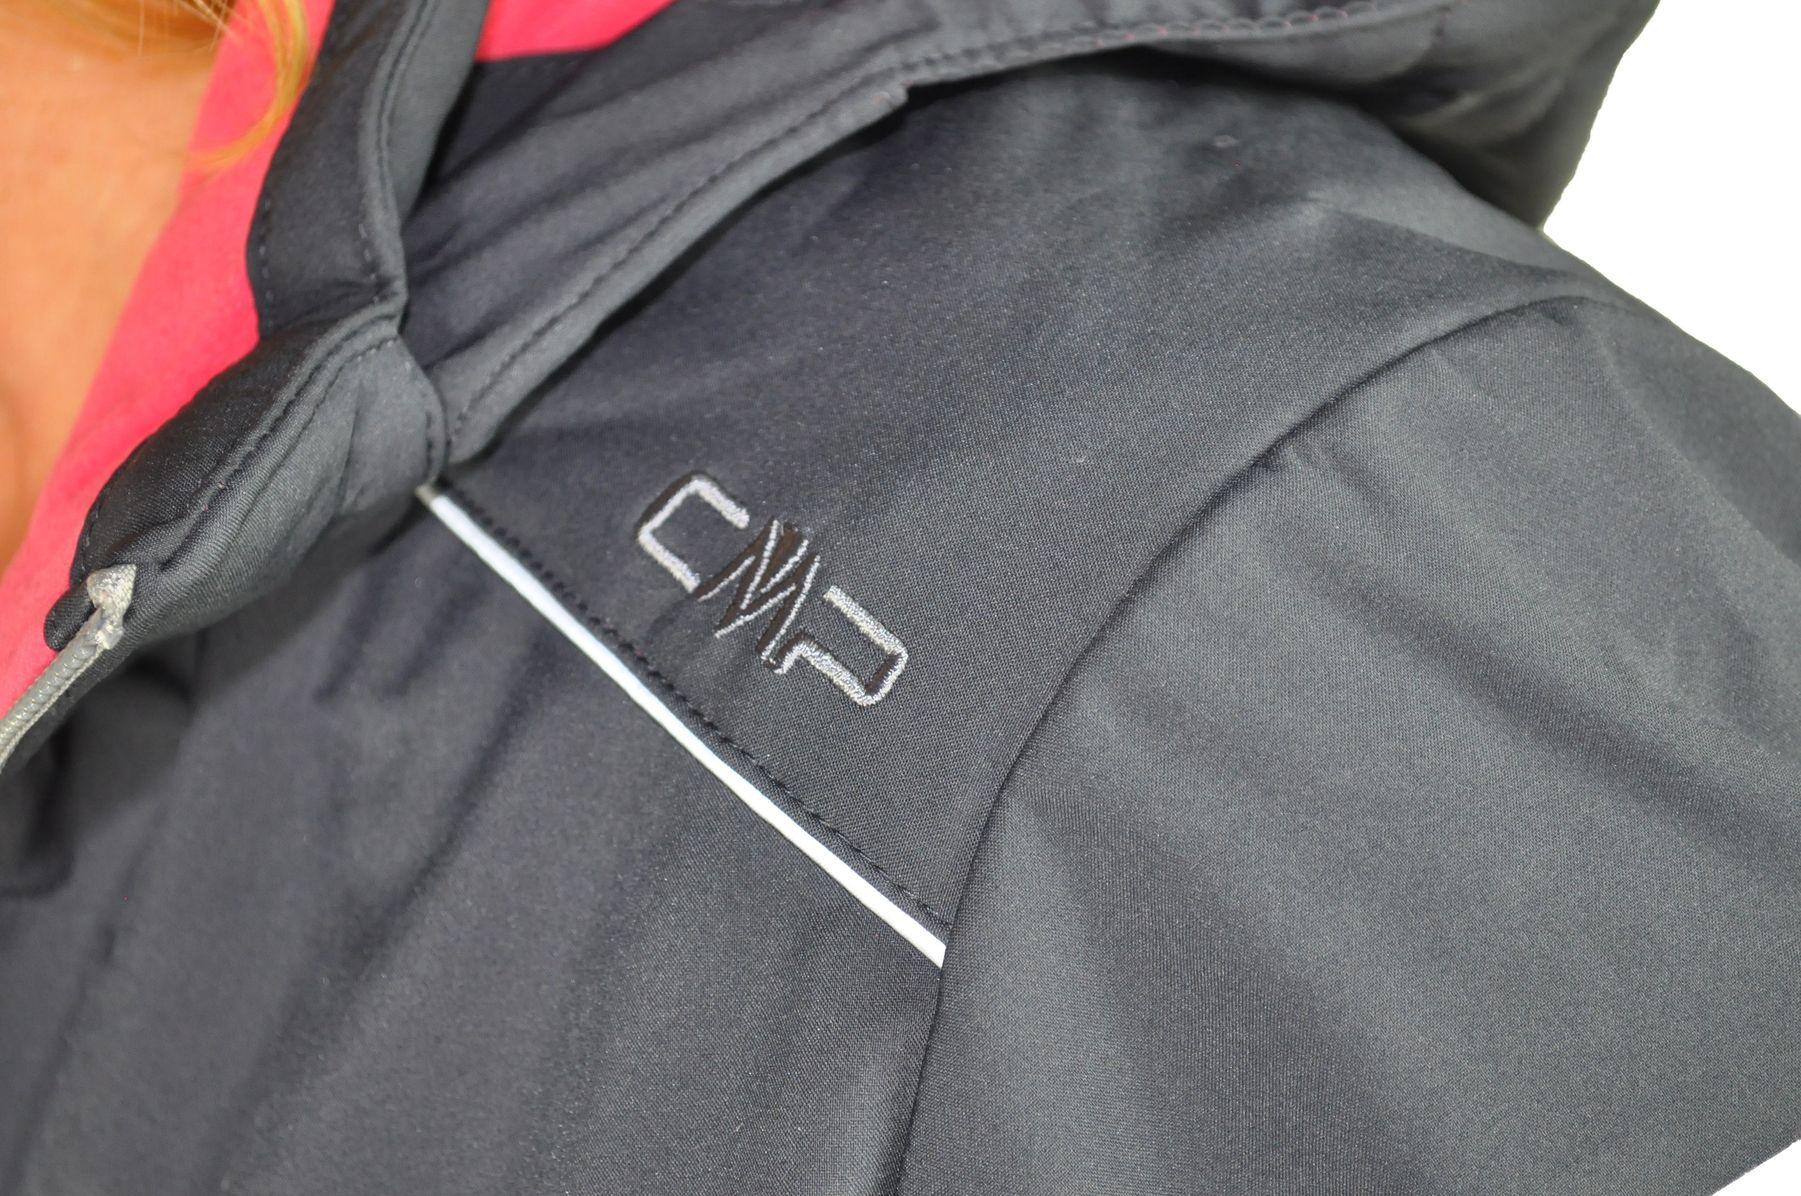 CMP - Damen Softshell Jacke, Winddicht, Wasserdicht, Atmungsaktiv (3A05396) – Bild 6